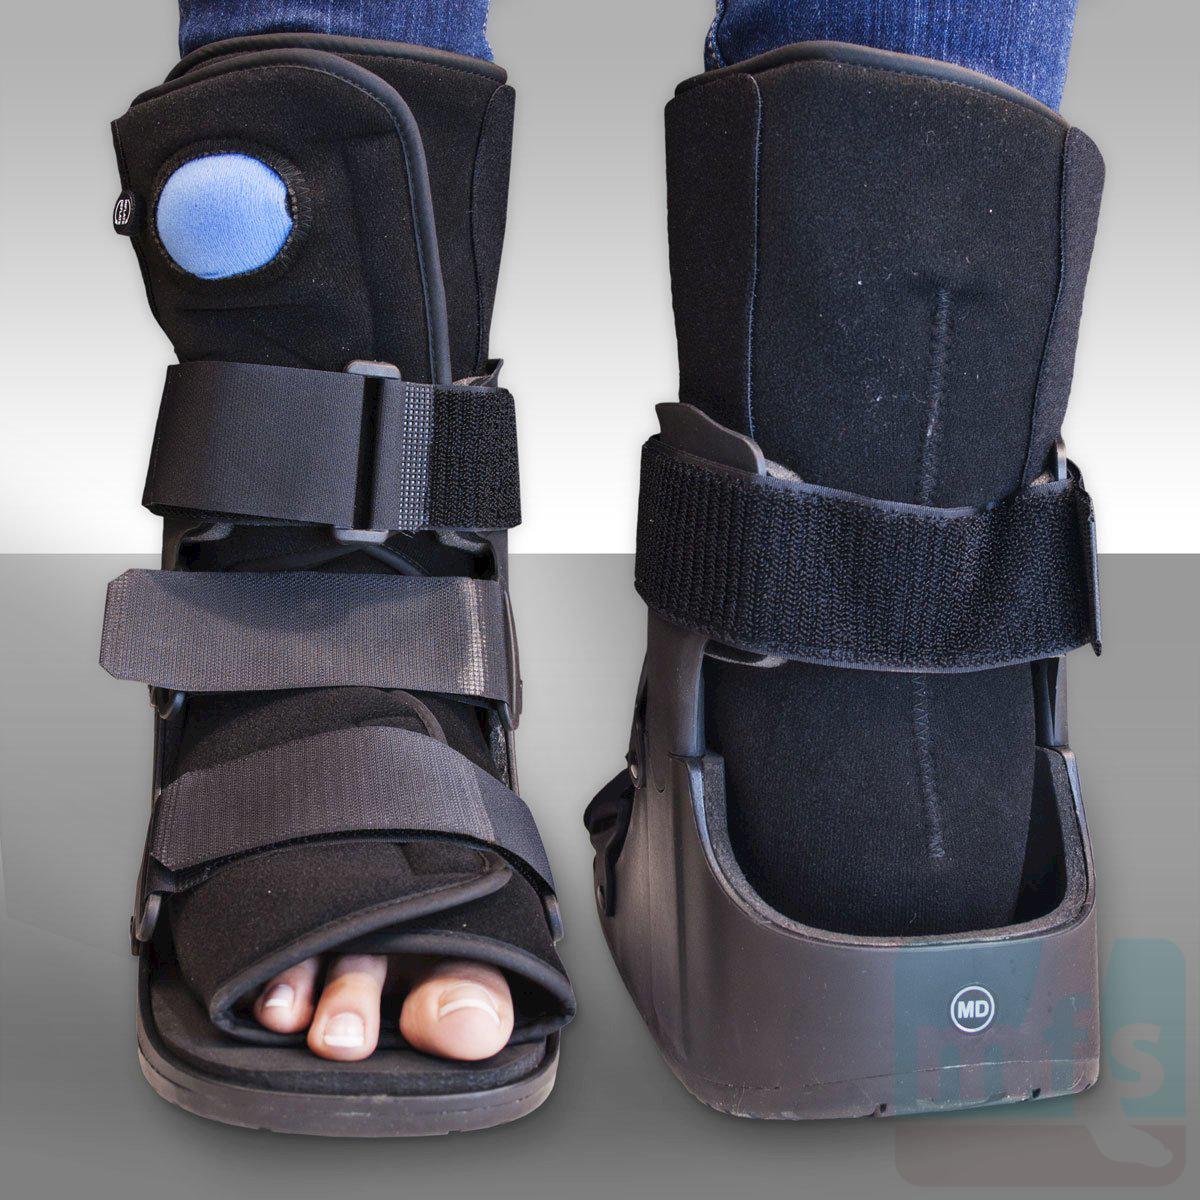 Walking Shoe For Broken Toe For Size